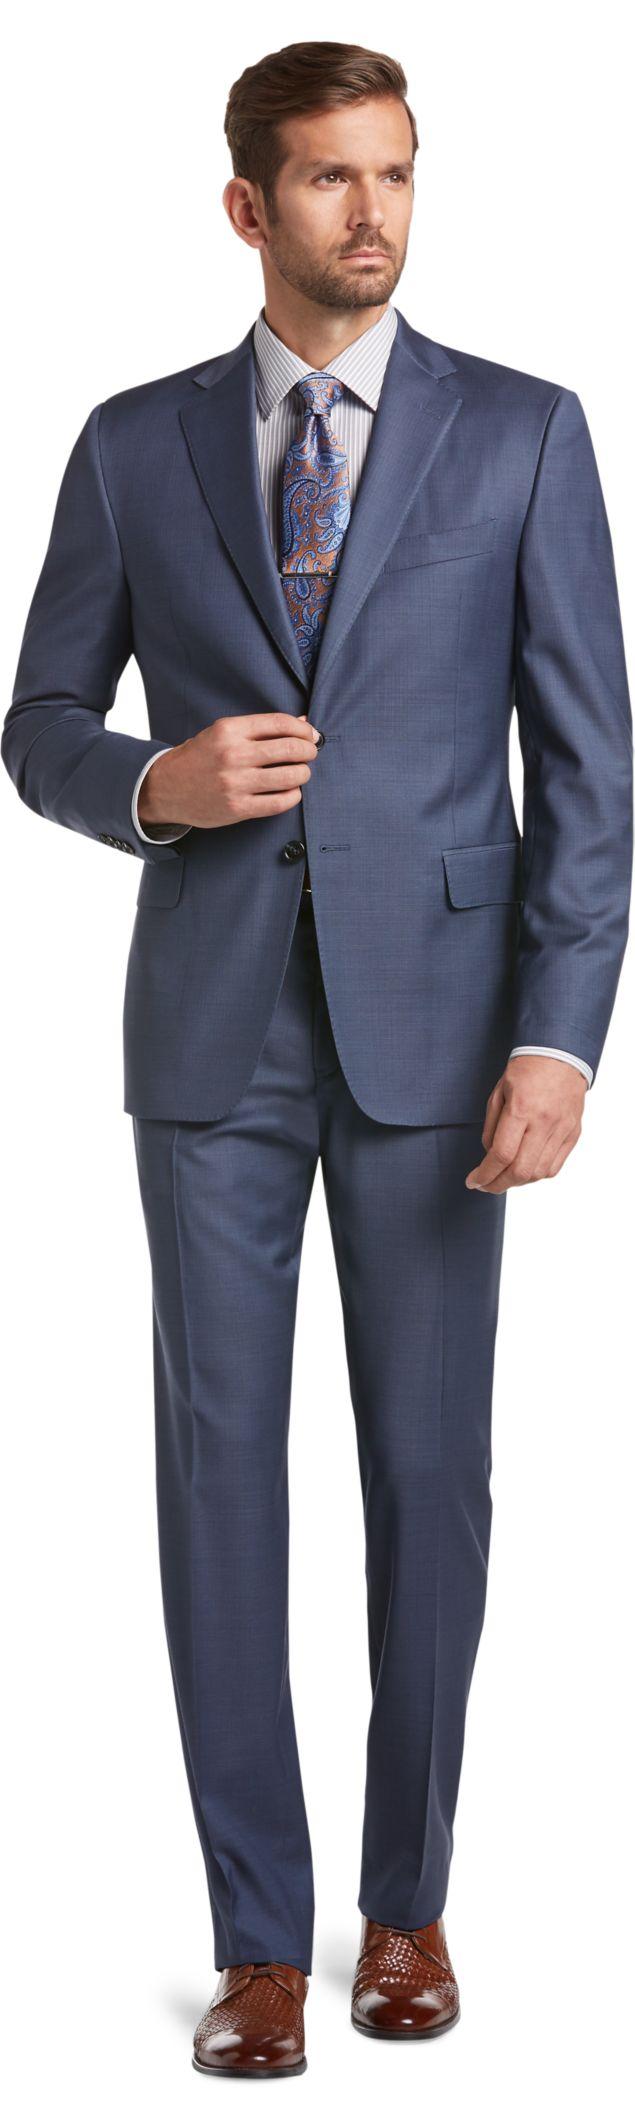 Shop Men's Suits on Sale | Discounted Suits | Jos A. Bank